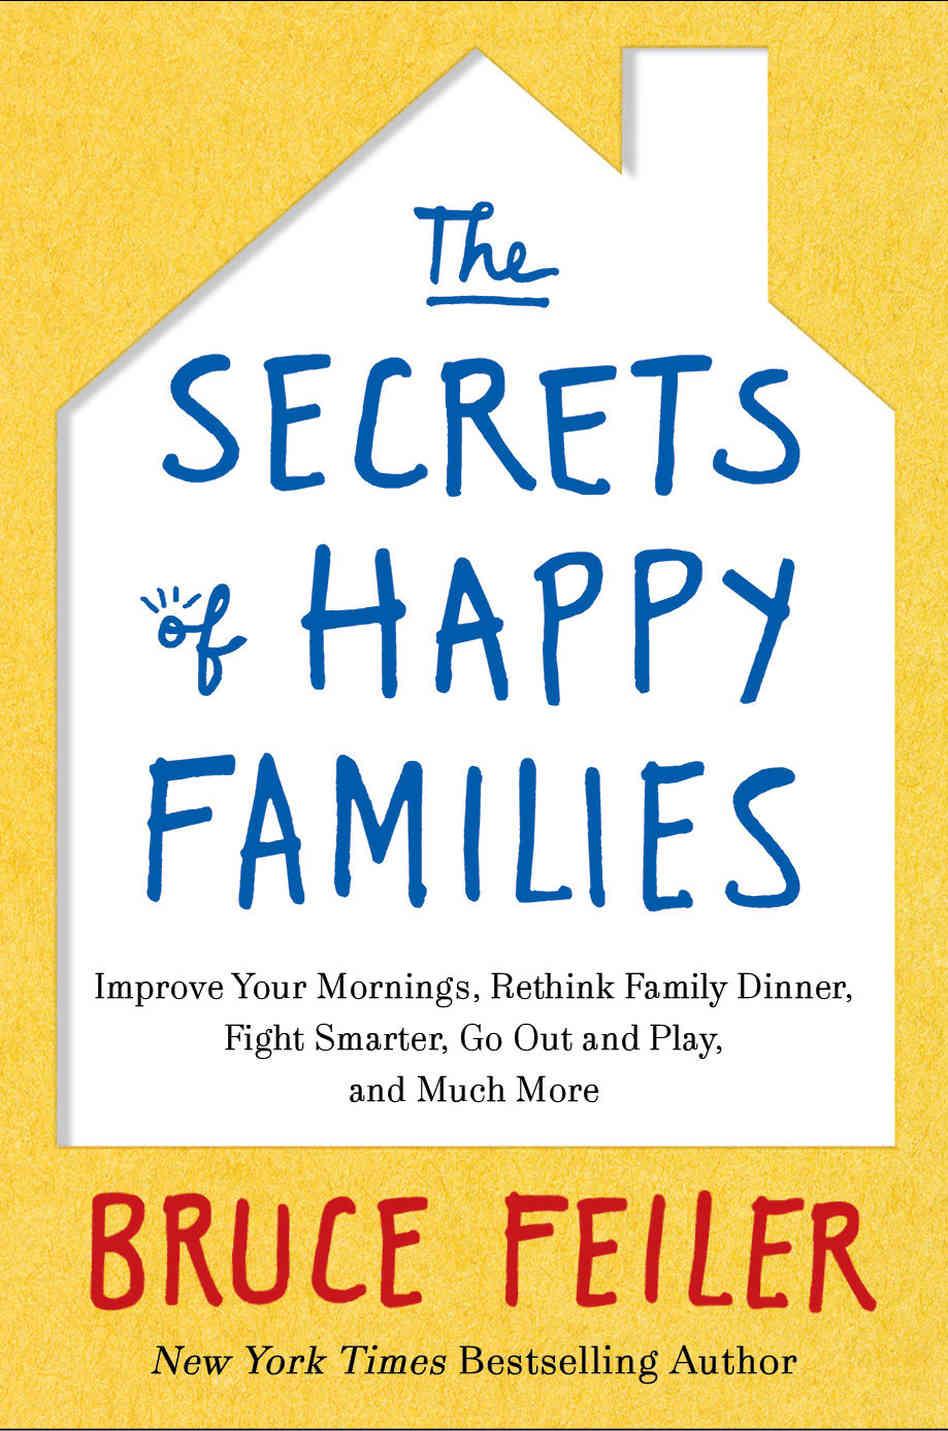 Secrets-of-happy-families_custom-8118a64a774e239a74862ef2cee8fd1958d0cf64-s6-c30.jpg